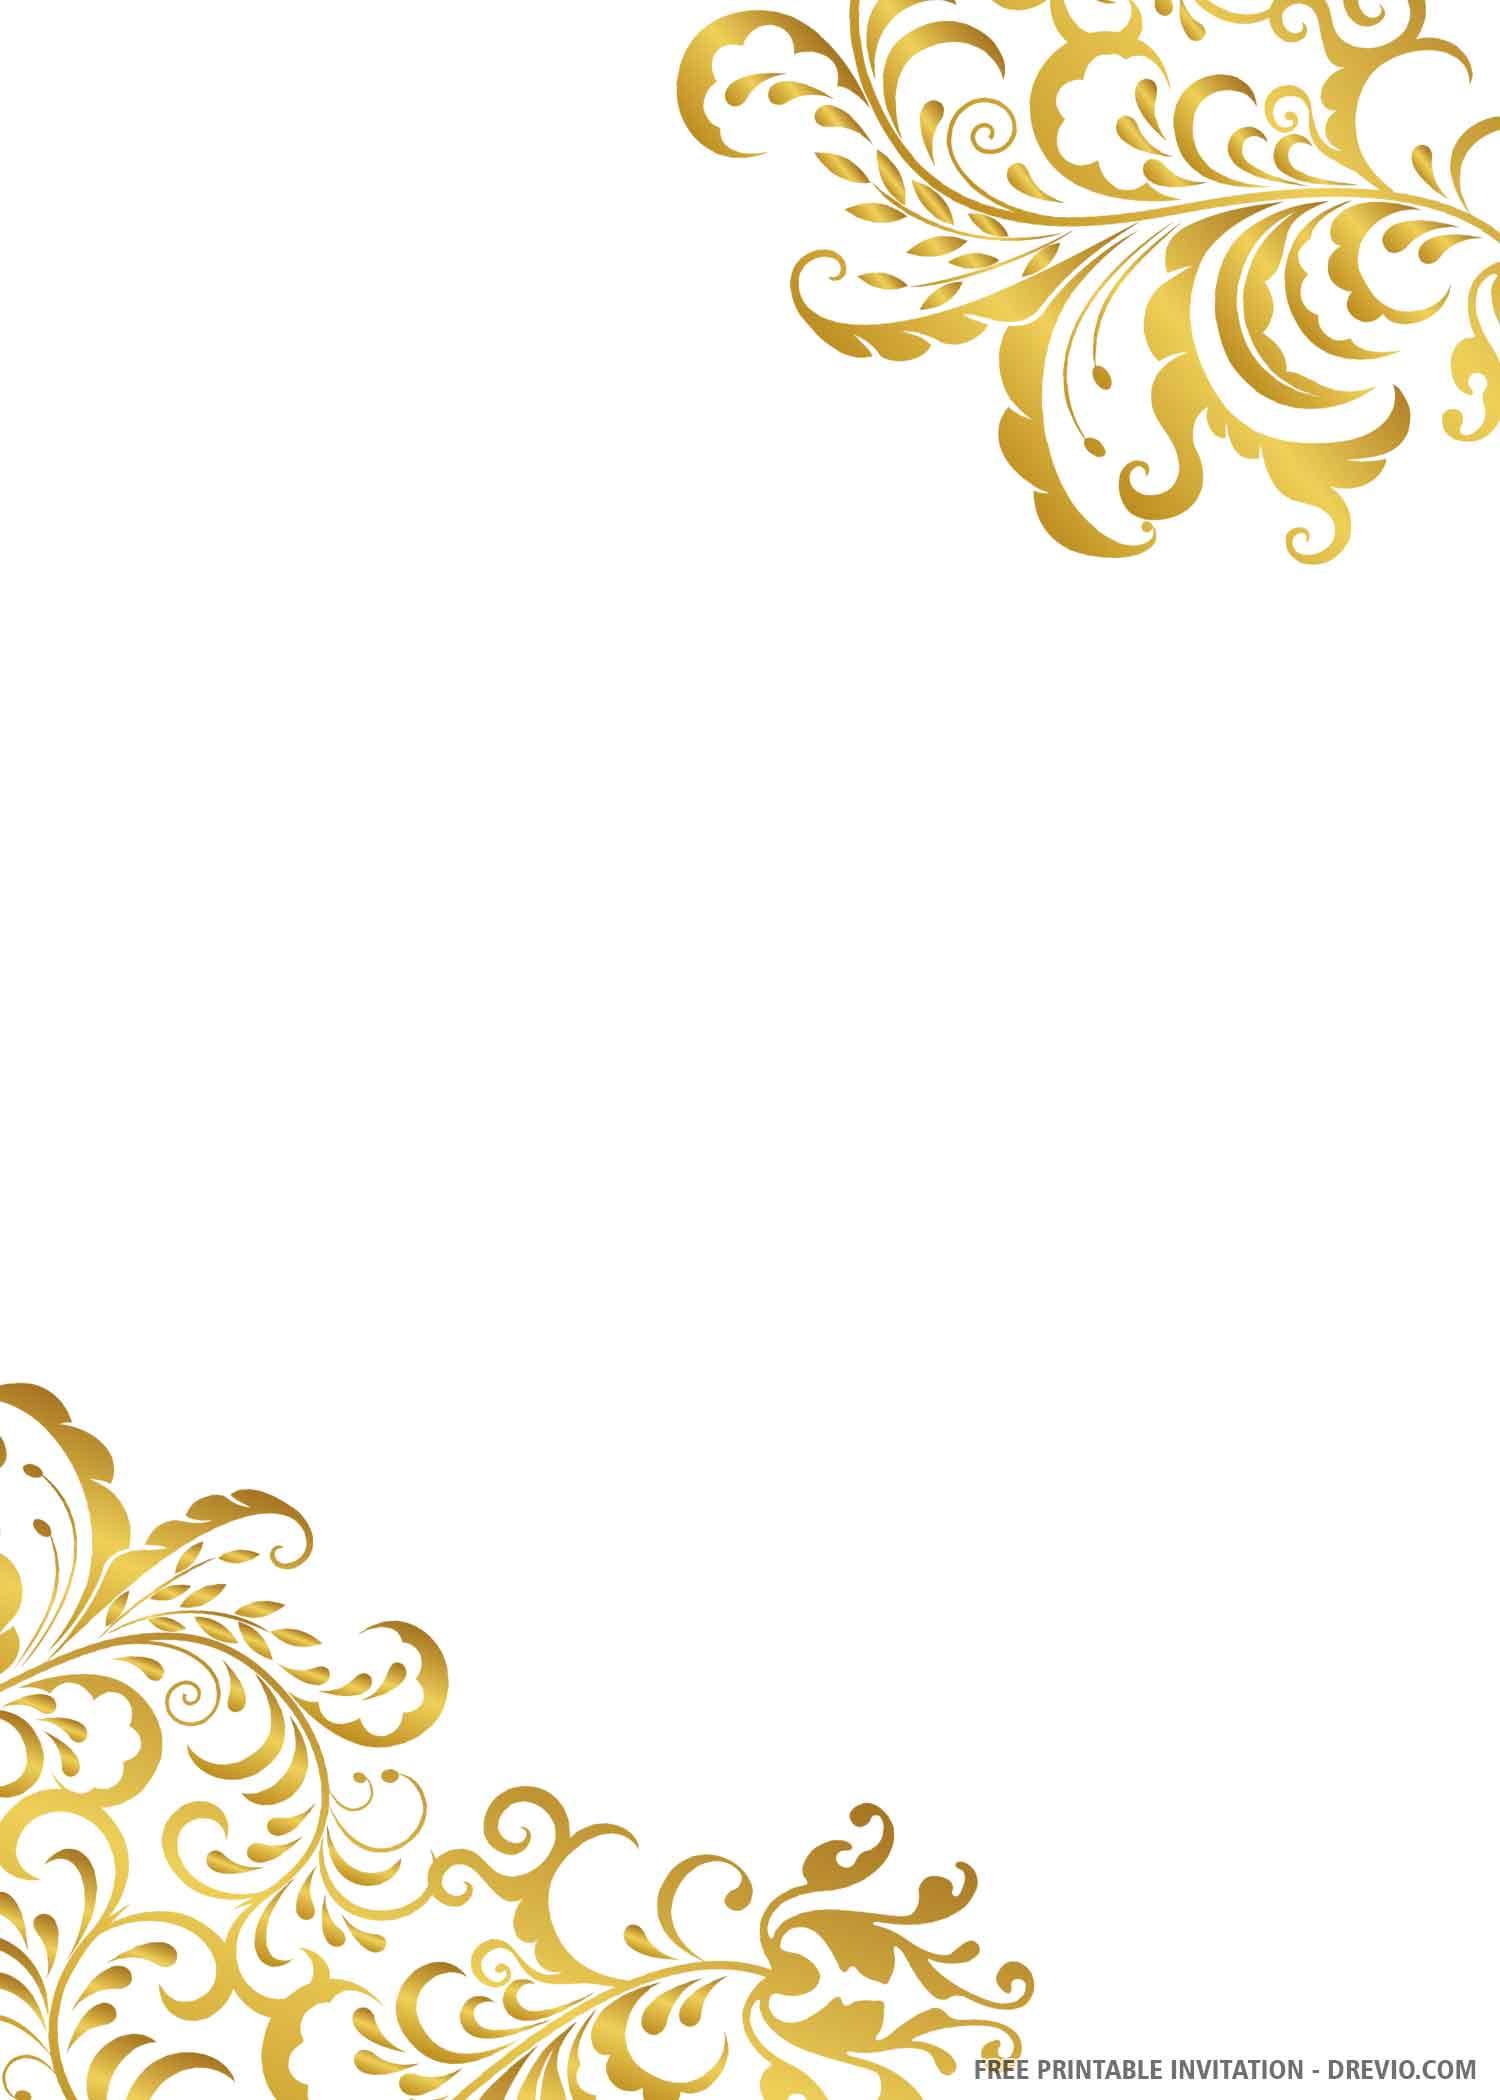 007 Unforgettable Printable Wedding Invitation Template Inspiration  Free For Microsoft Word VintageFull